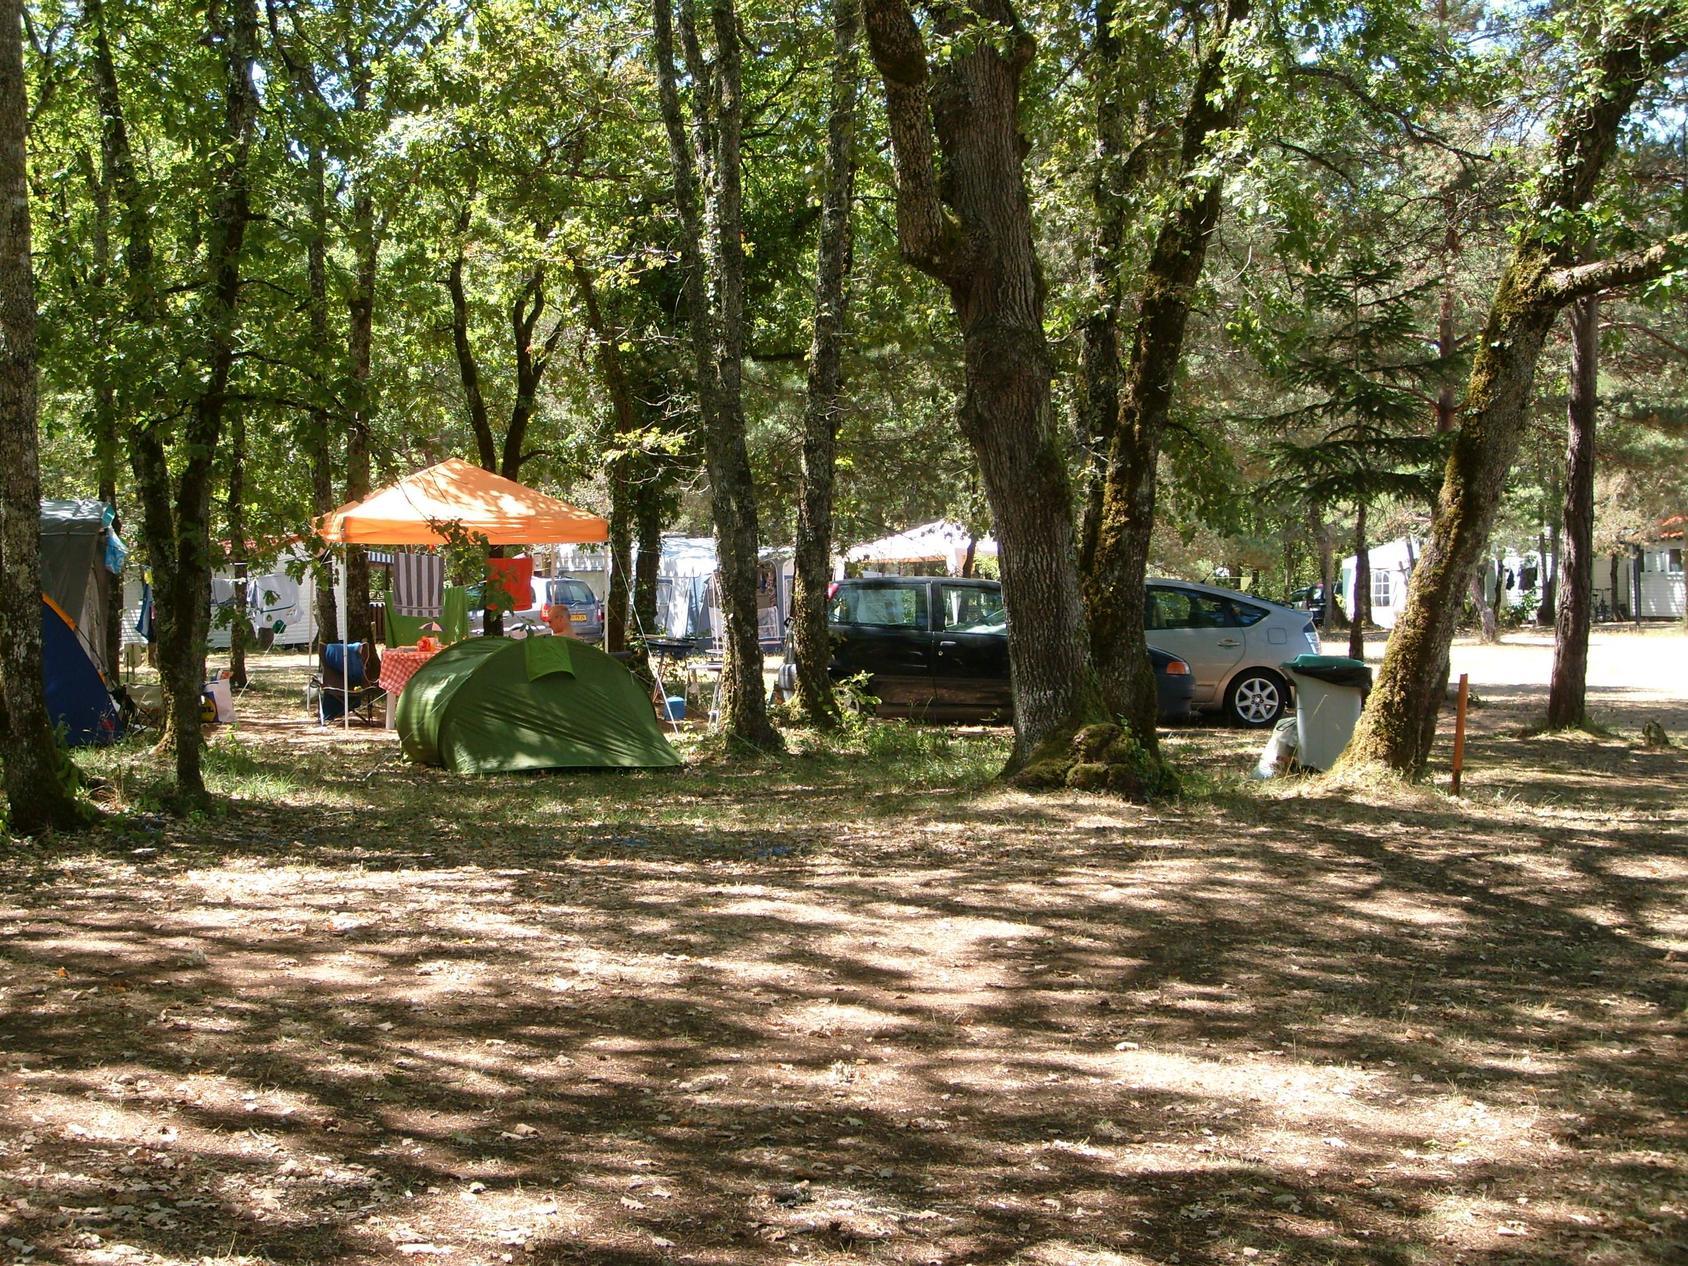 Frankrijk-Pezuls-Camping%20La%20Foret-ExtraLarge Wintersport Frankrijk Pagina 3 van 55